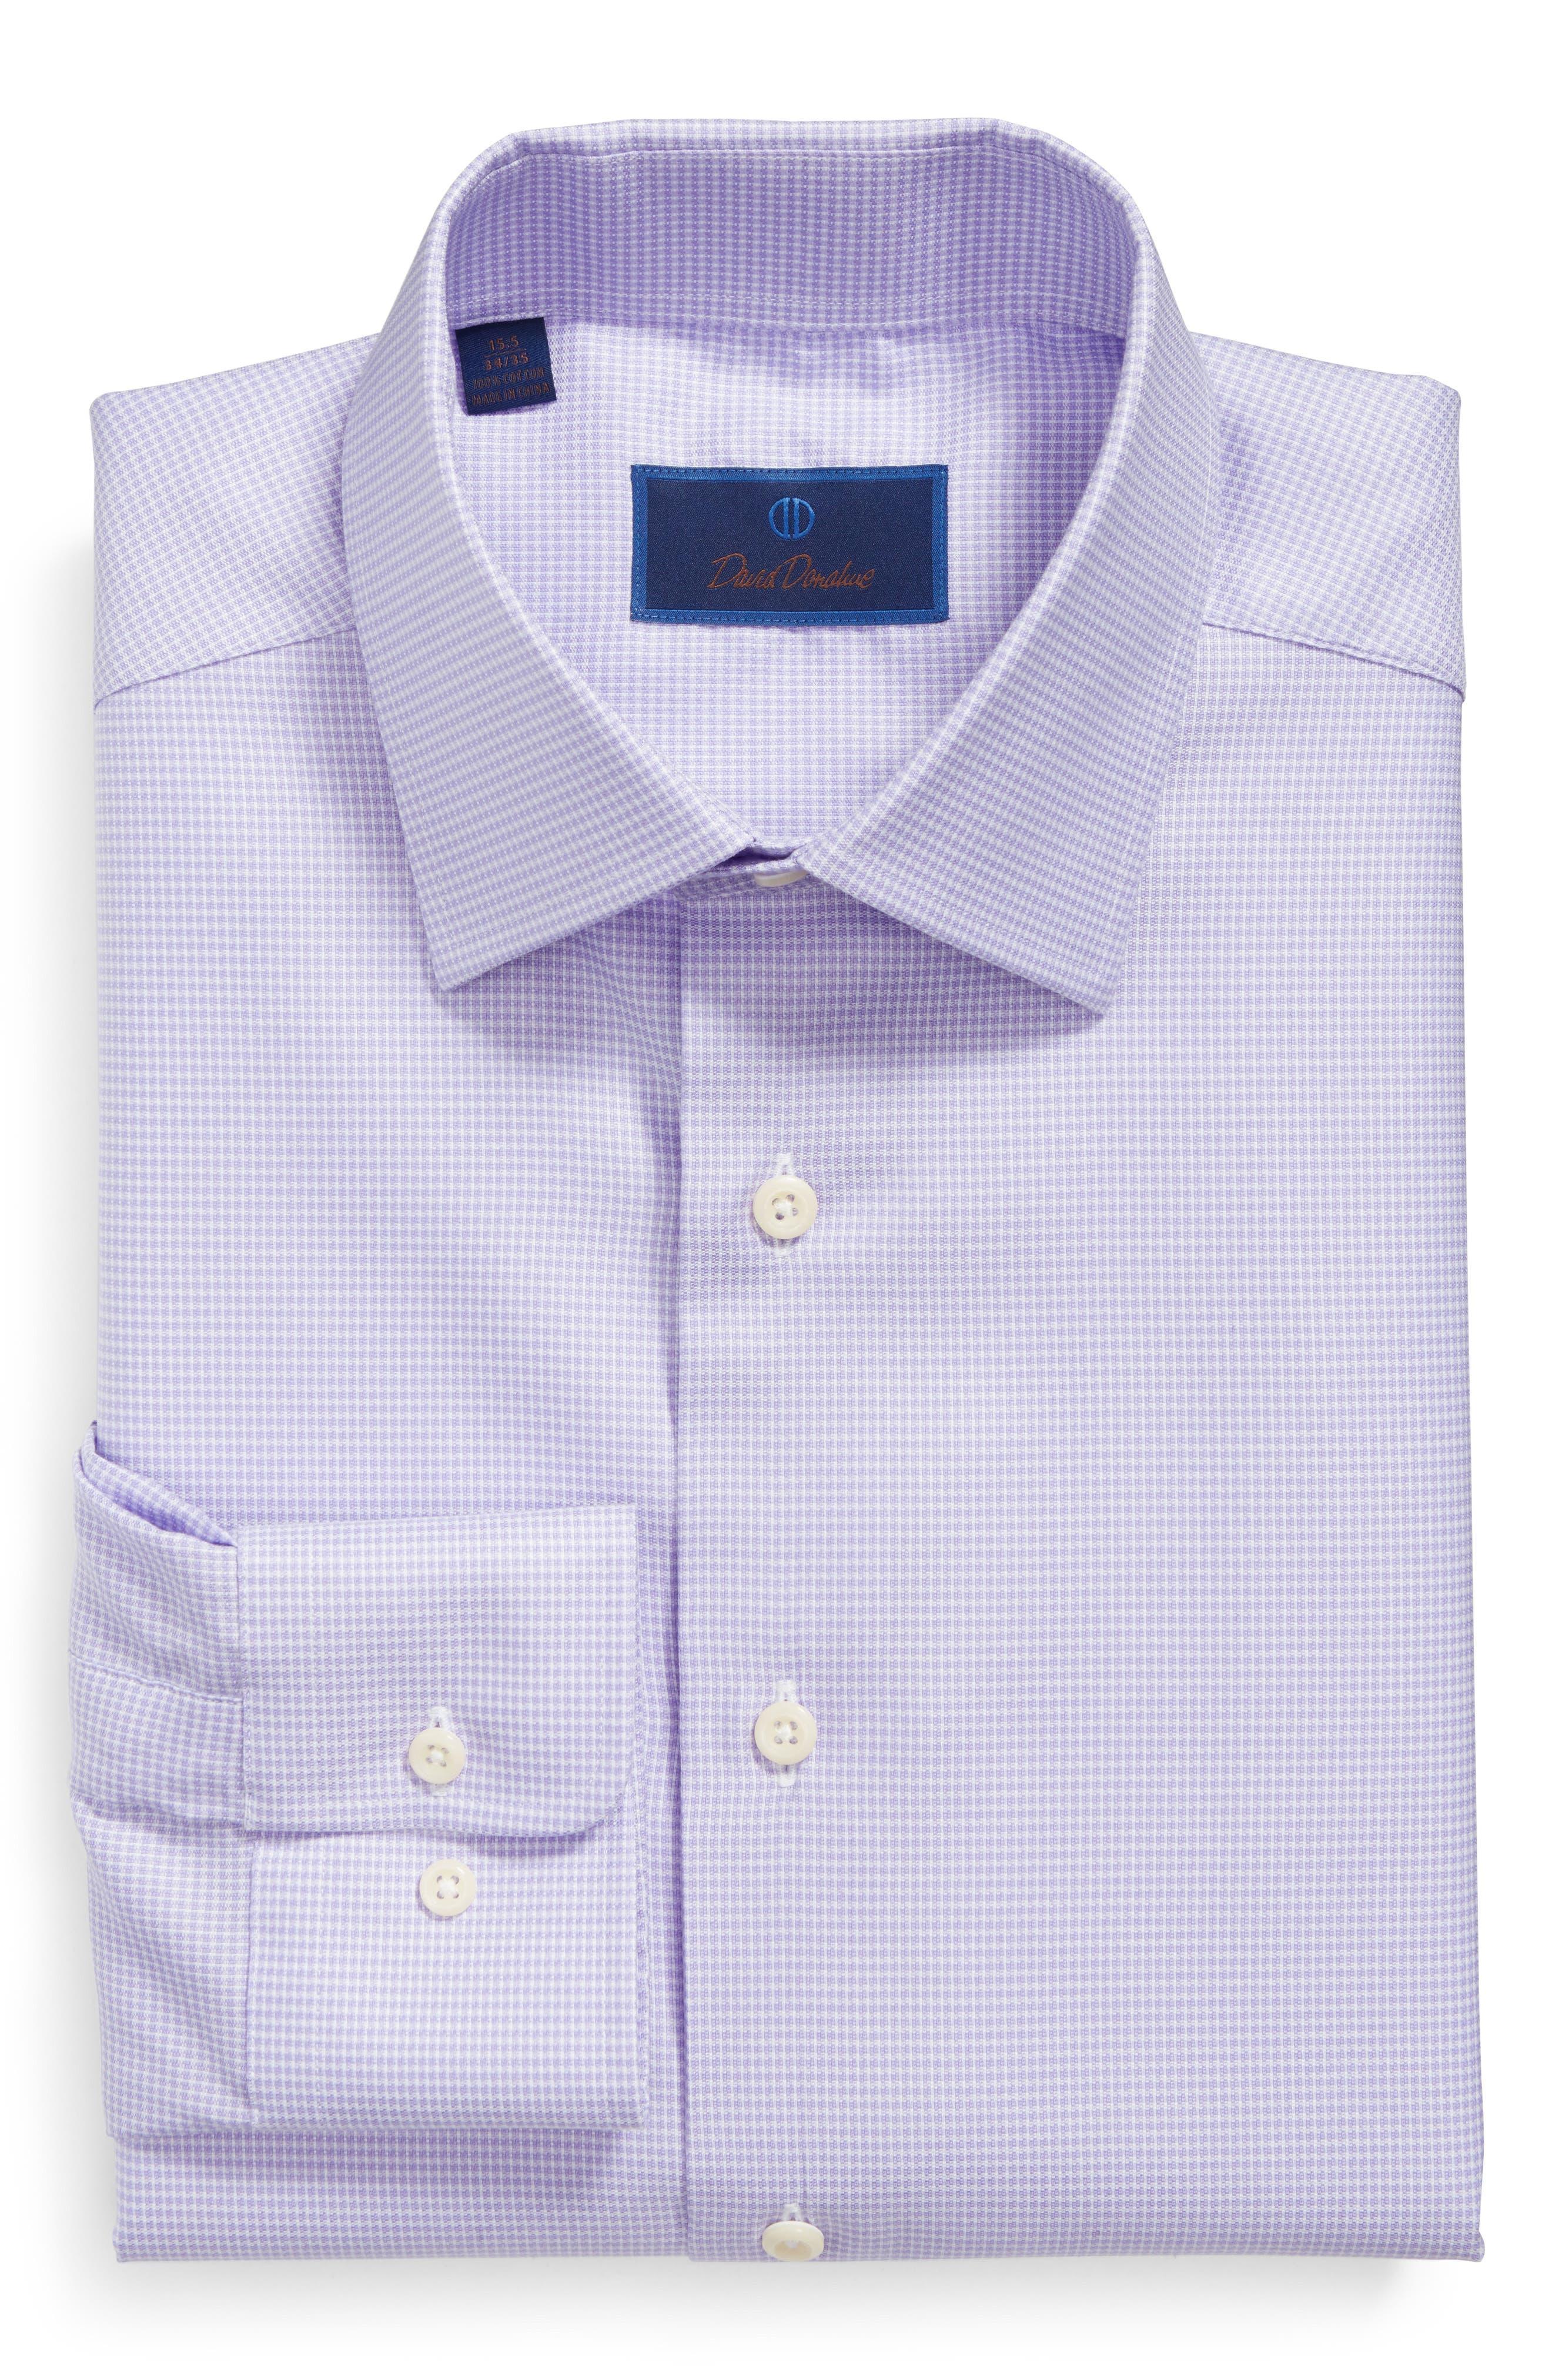 David Donahue Regular Fit Houndstooth Dress Shirt